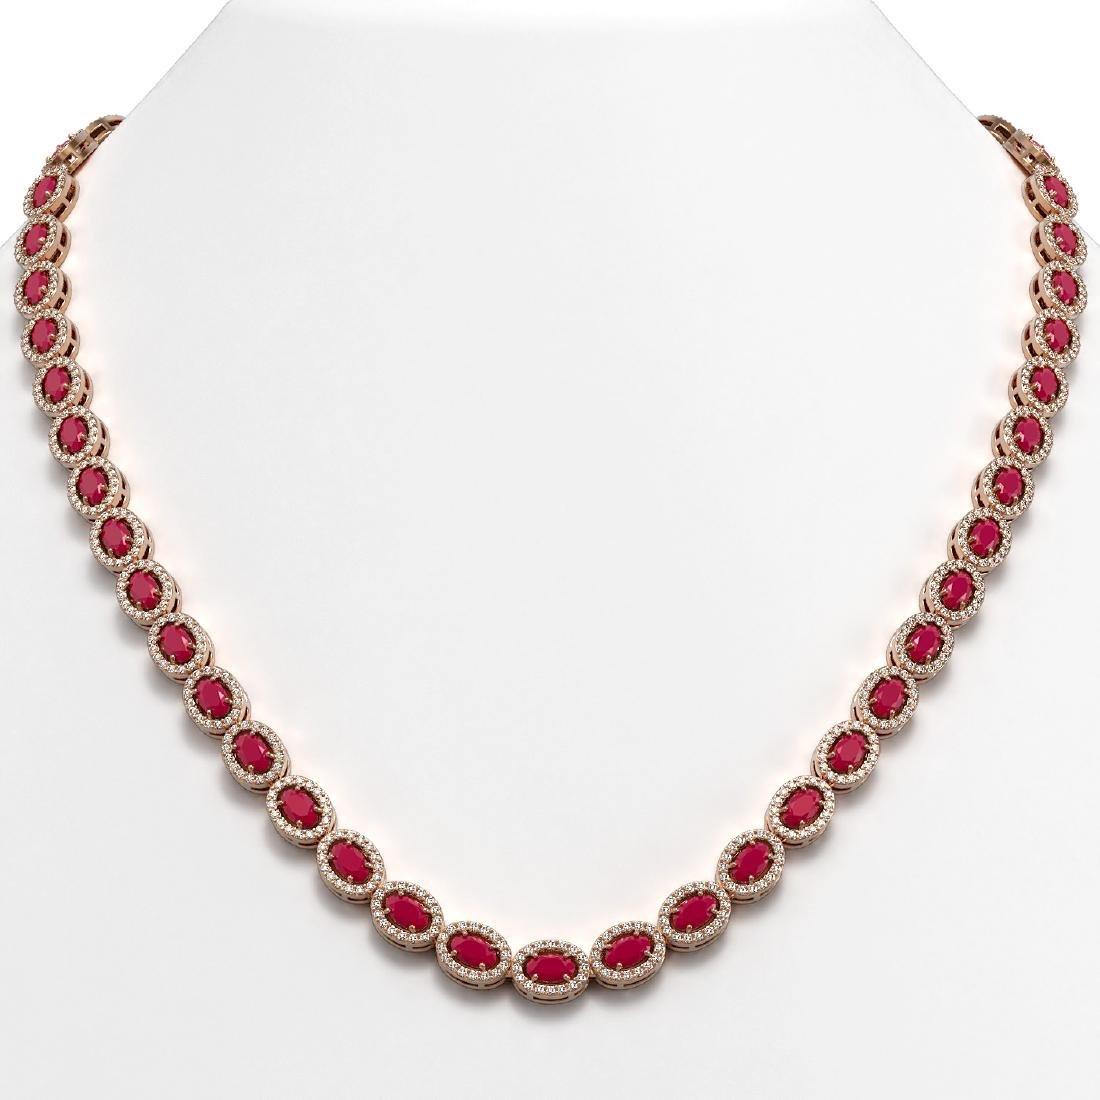 26.38 CTW Ruby & Diamond Halo Necklace 10K Rose Gold